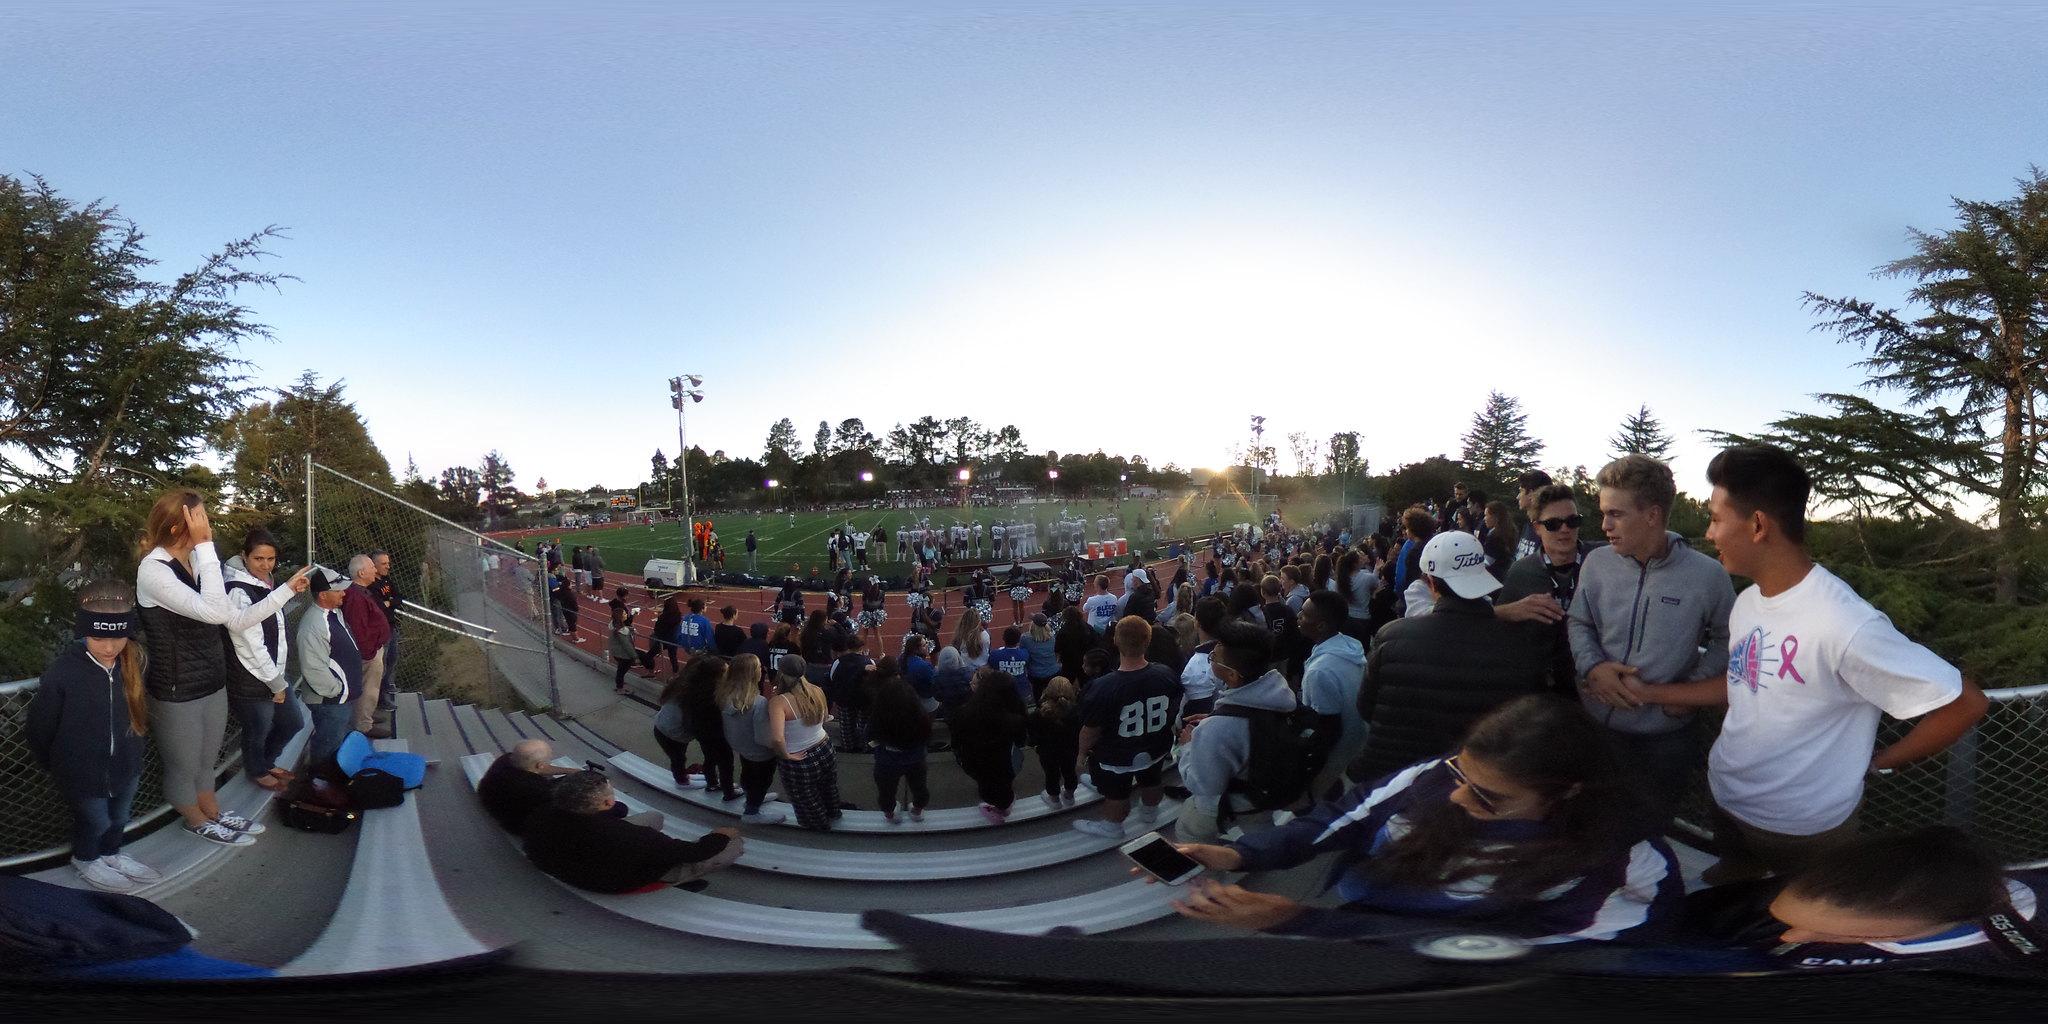 August 26, 2016 Aragon vs. Carlmont